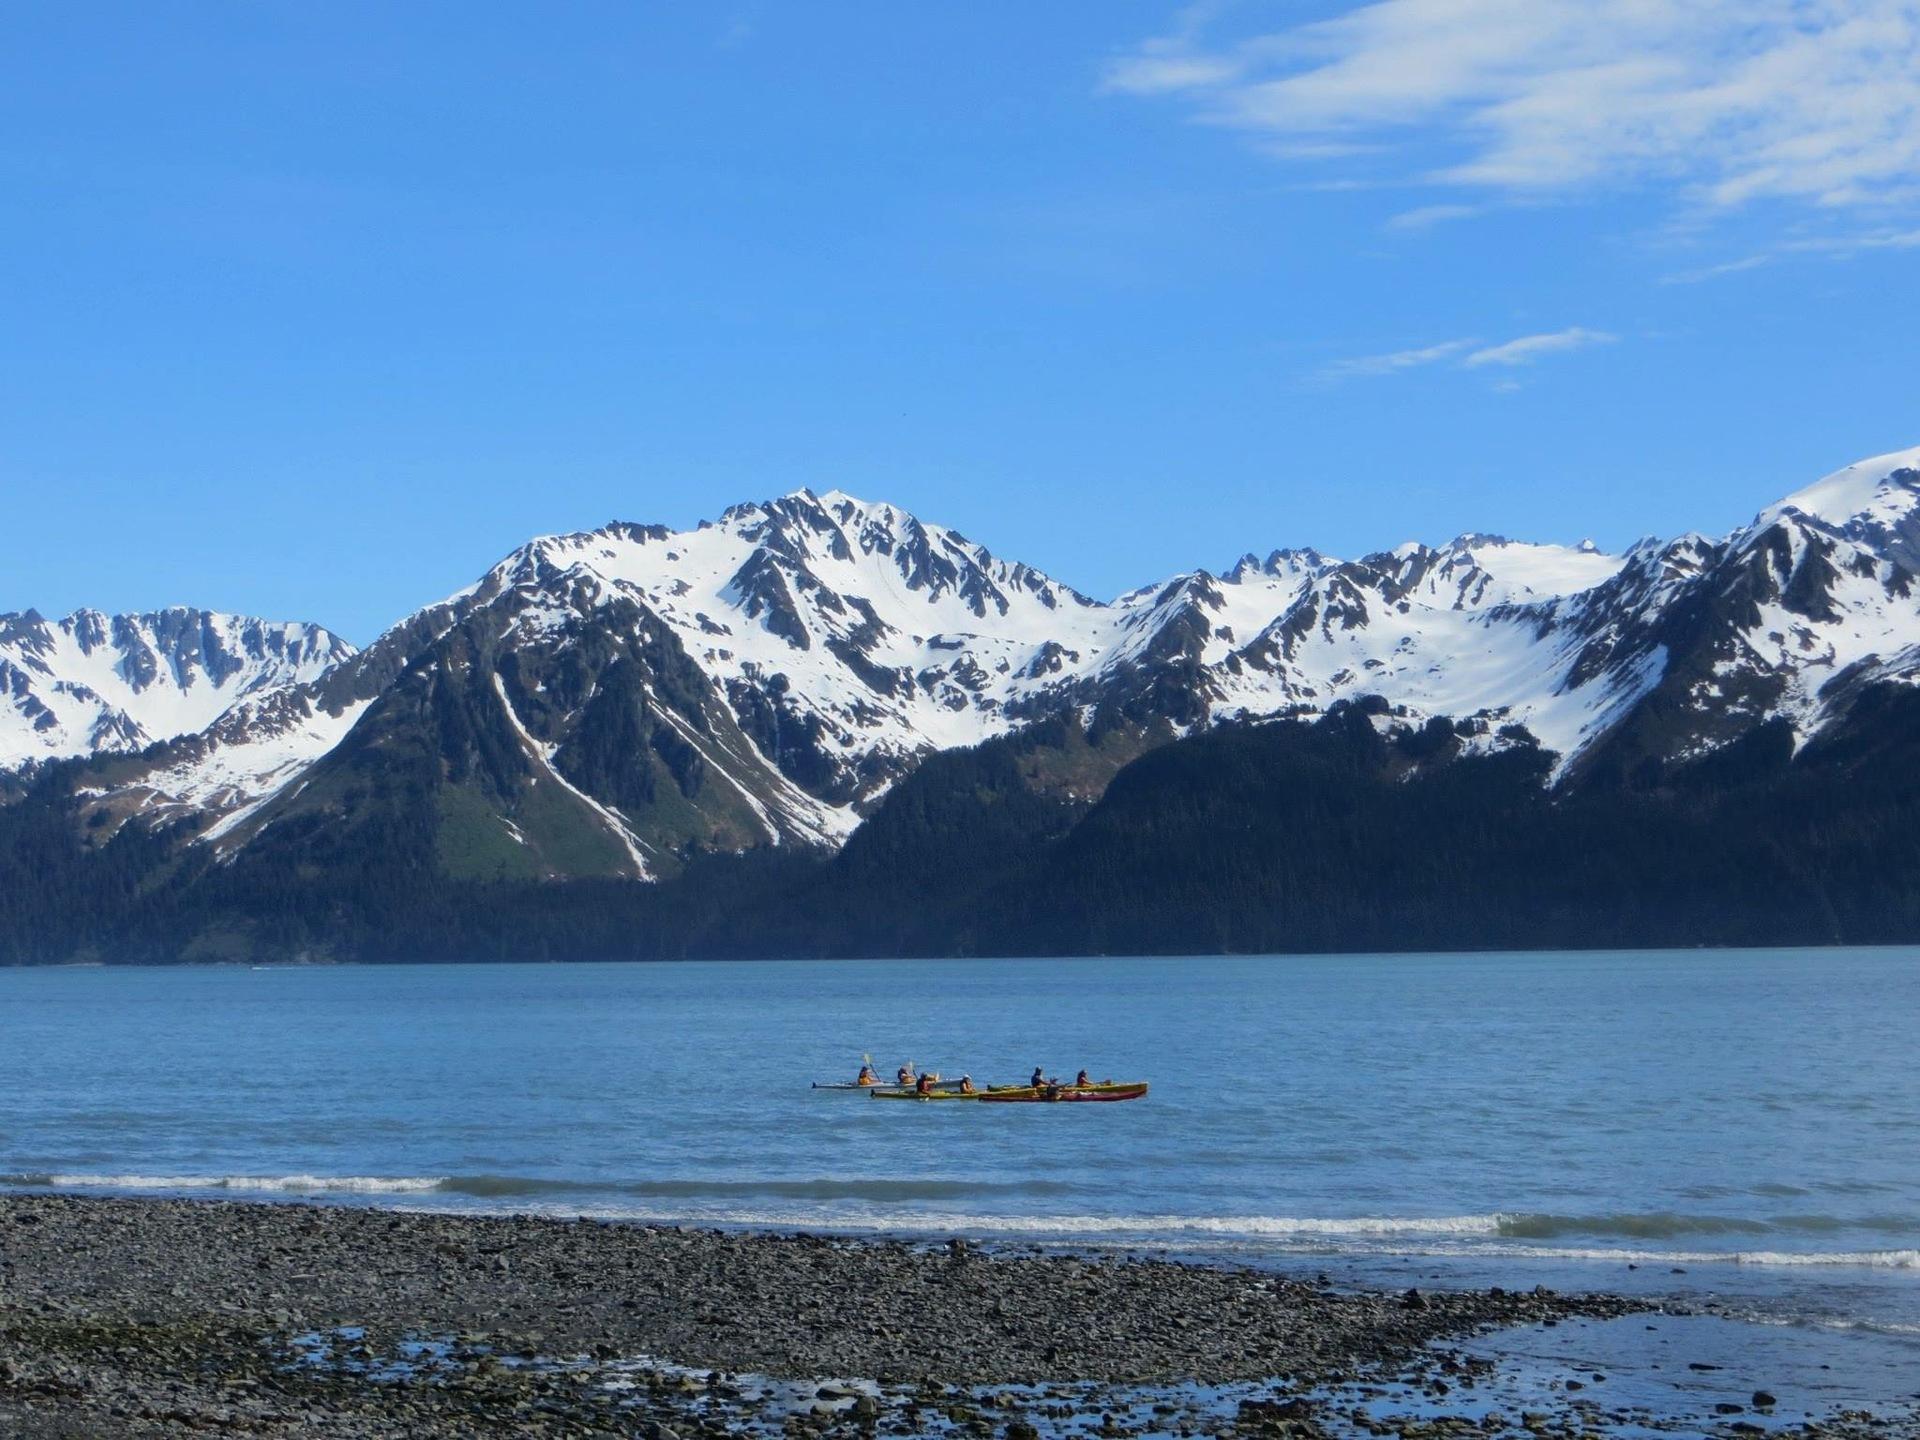 Kayaking  | 1russian6717, adventure, daytime, glacier